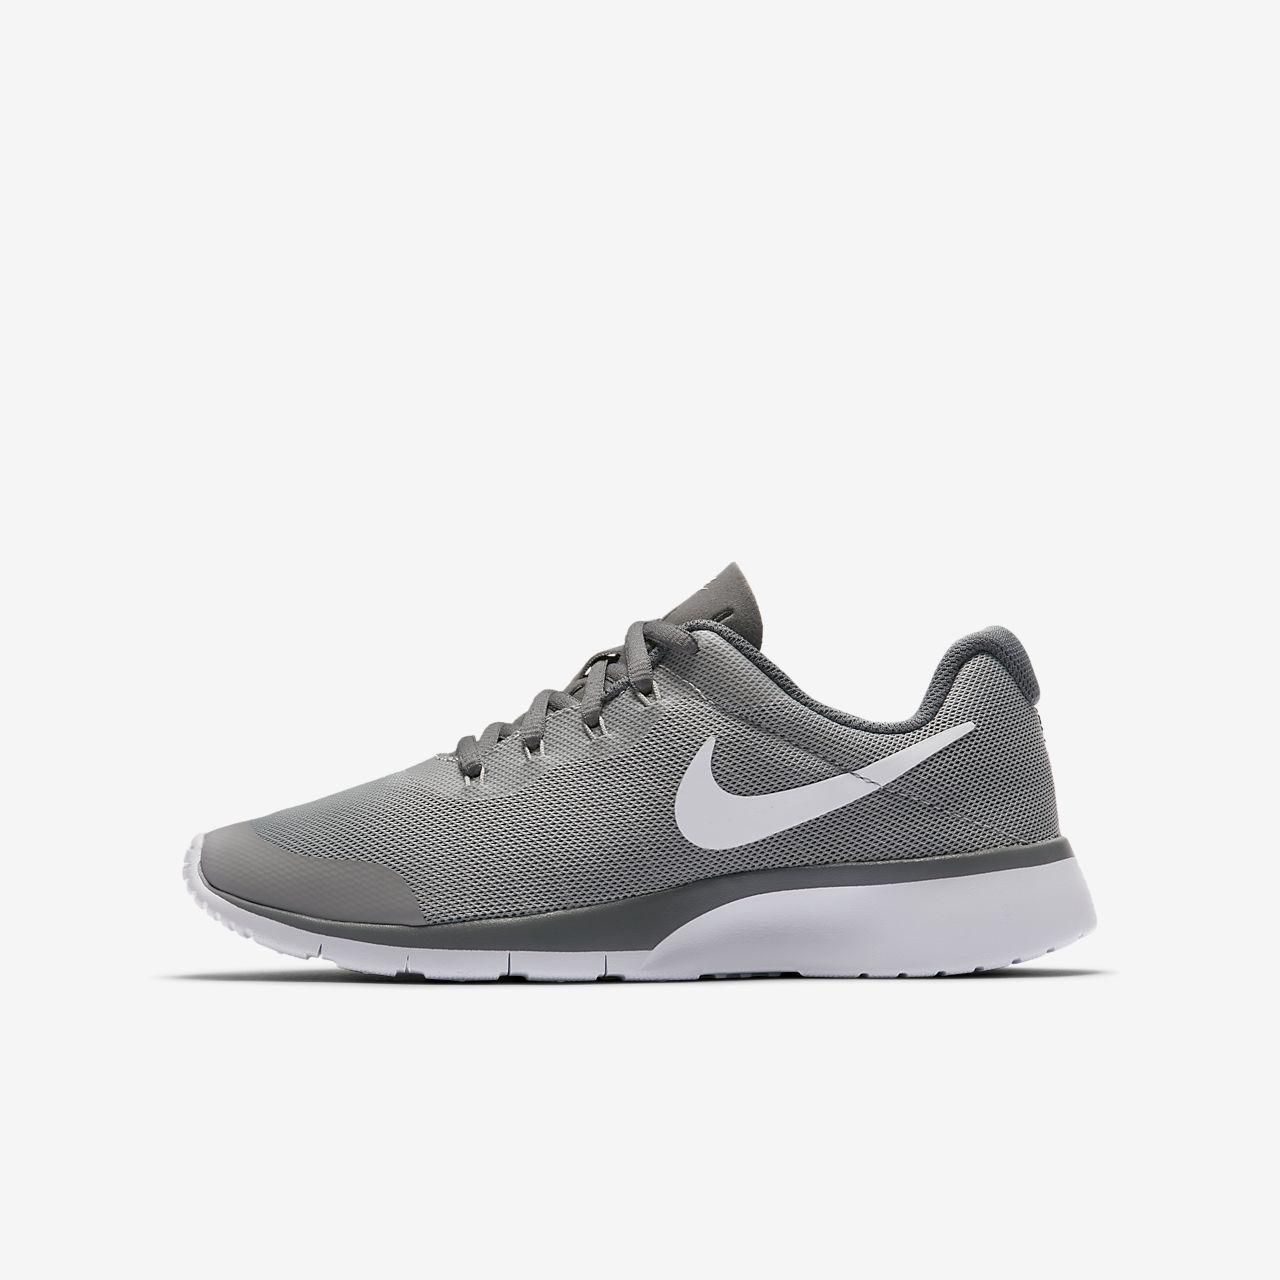 Zapatos grises Nike Tanjun infantiles ZwPJRup9